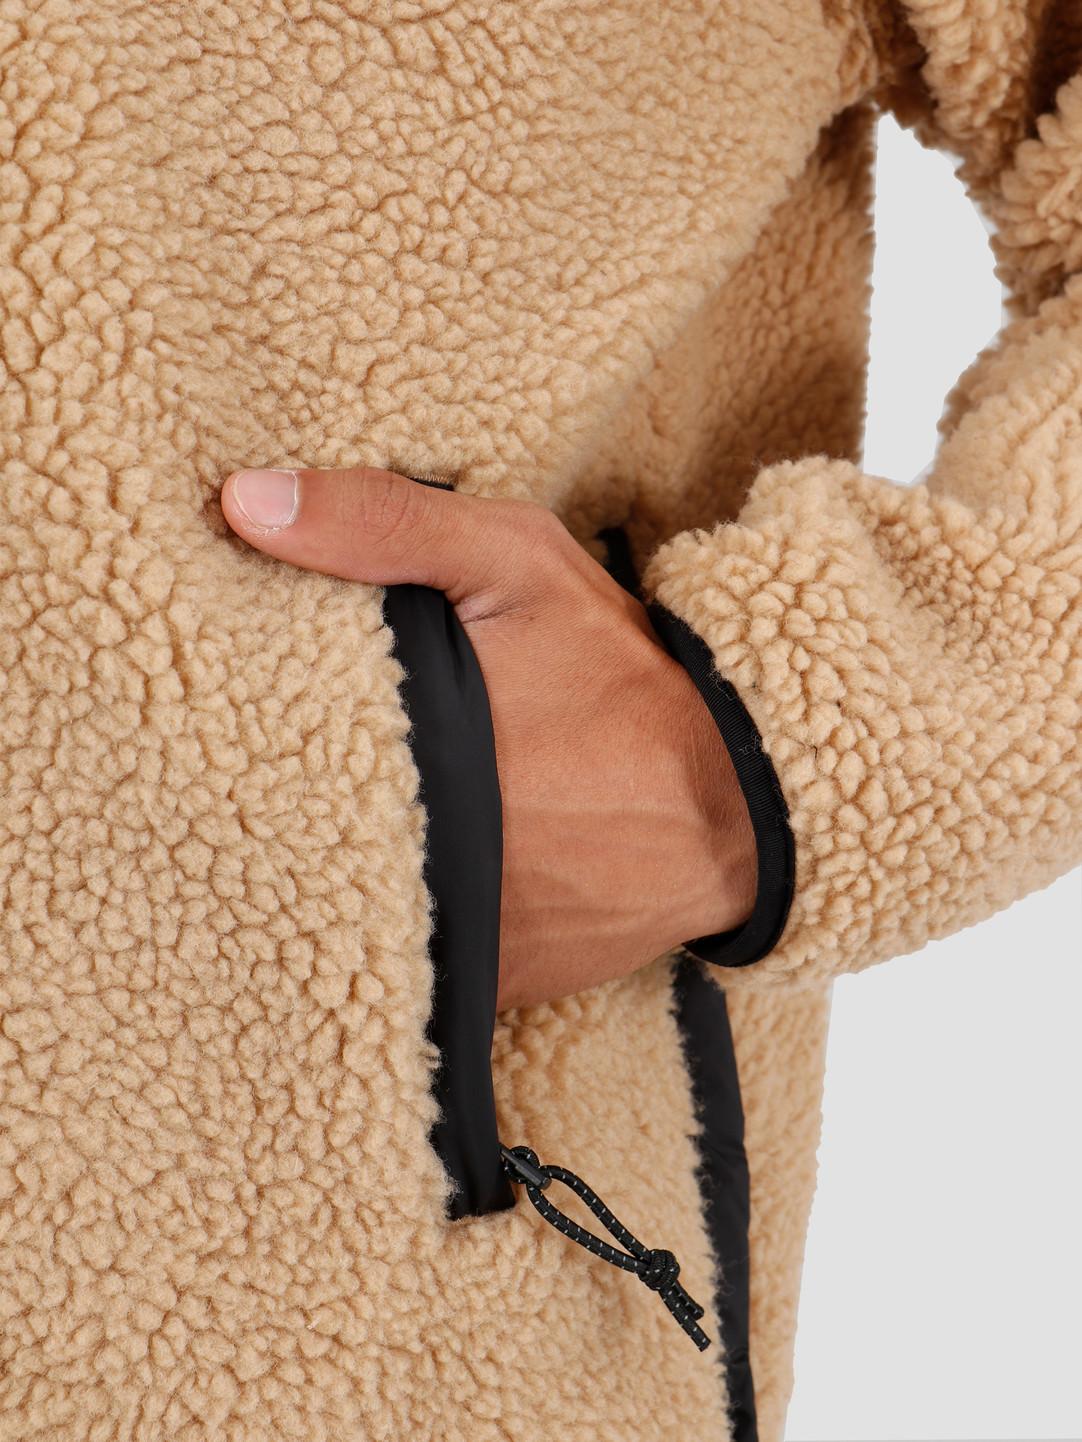 Carhartt WIP Carhartt WIP Prentis Pullover Dusty H Brown I027123